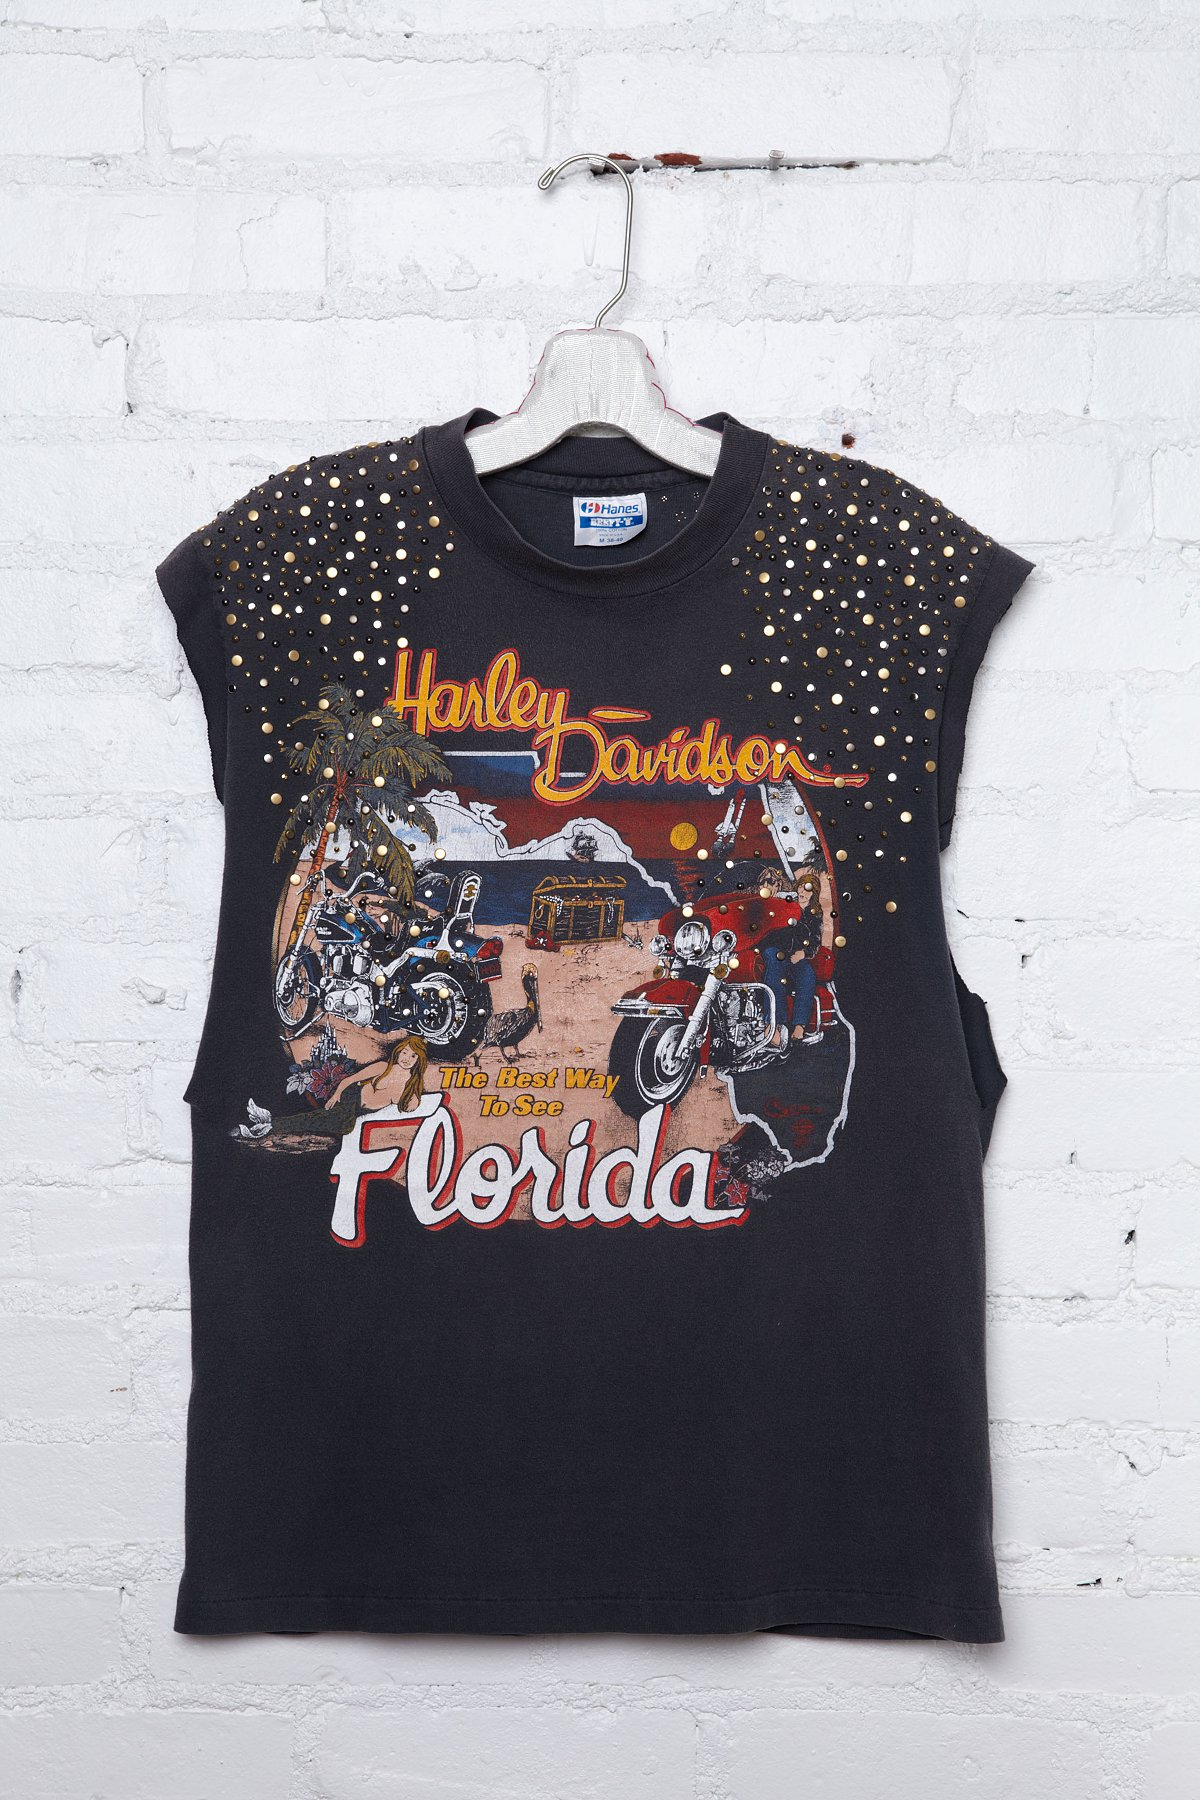 Vintage Studded Harley Davidson Tee